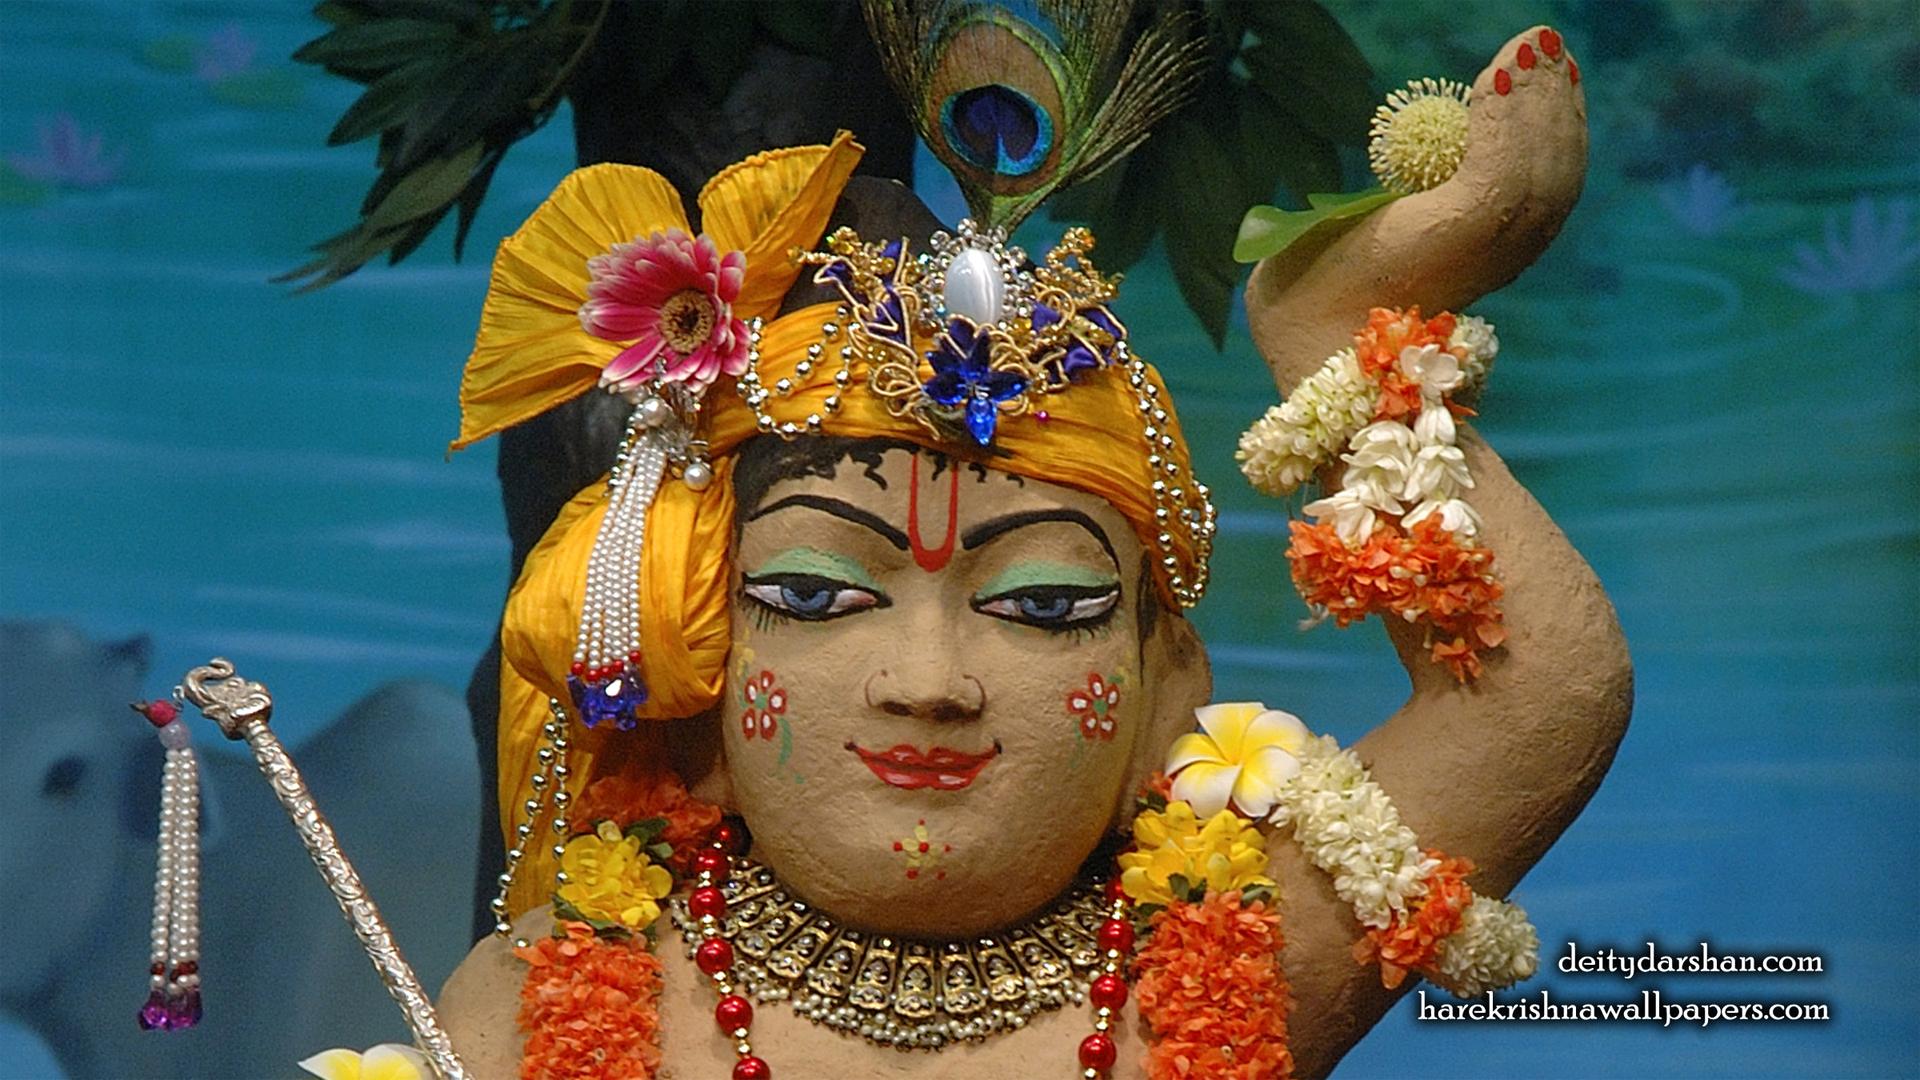 Sri Gopal Close up Wallpaper (039) Size 1920x1080 Download